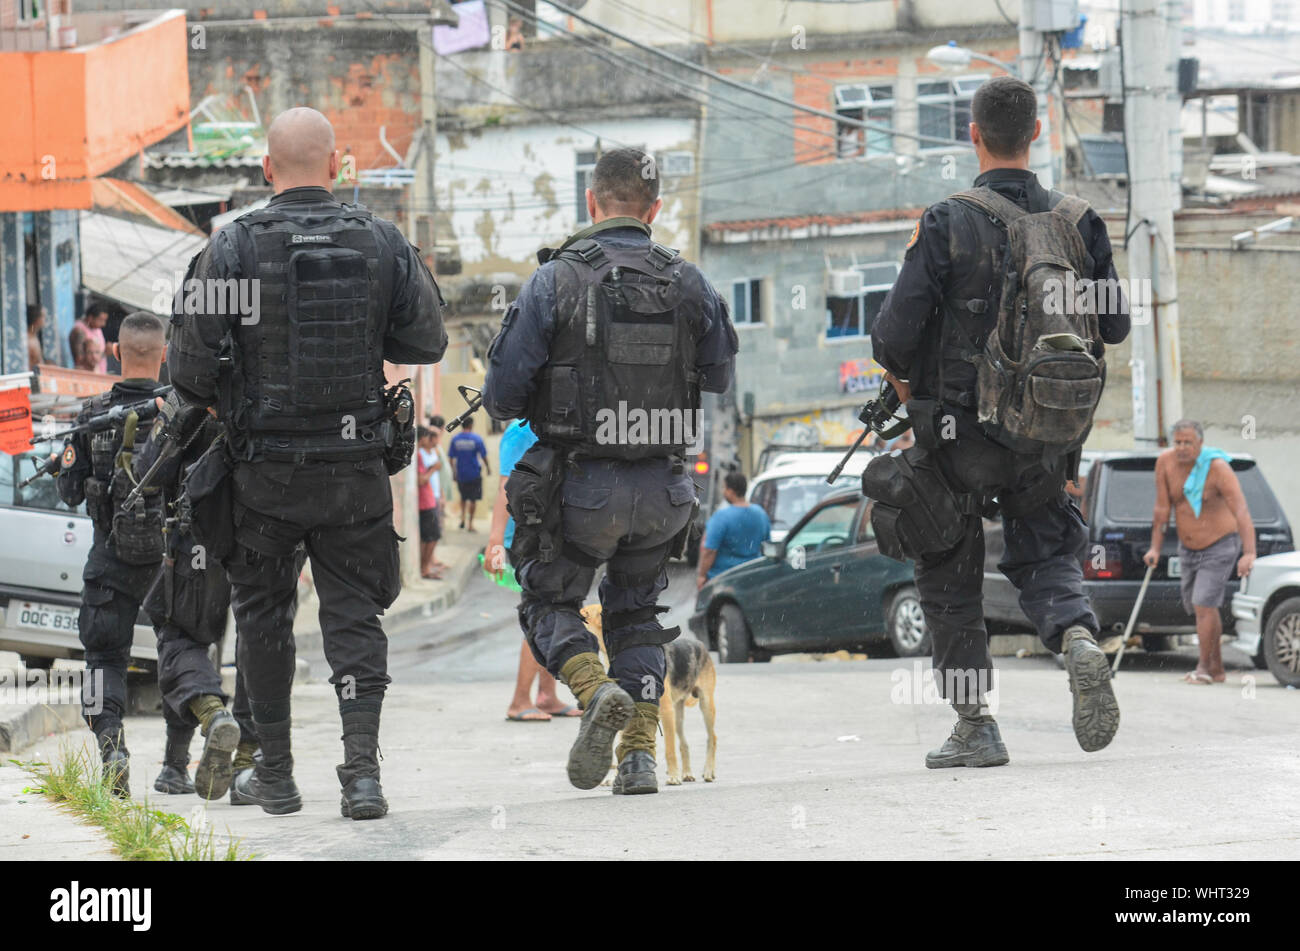 RIO DE JANEIRO, BRAZIL, MARCH, 21, 2015: Rio de Janeiro military police with snipers patrolling the German complex, slum complex Stock Photo